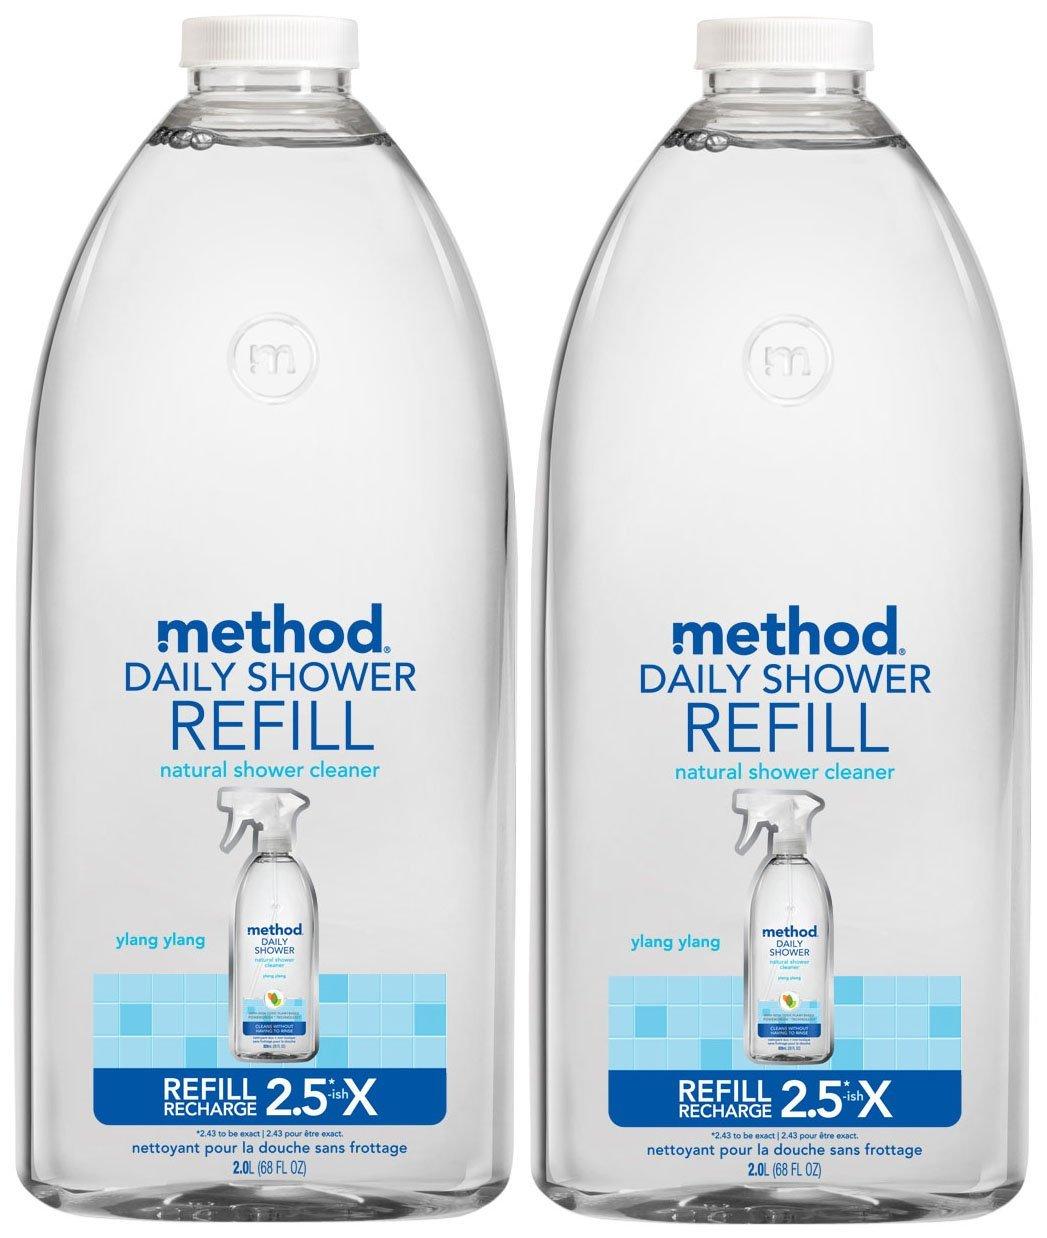 Method Daily Shower Refill - Ylang Ylang - 68 oz - 2 pk by Method (Image #1)